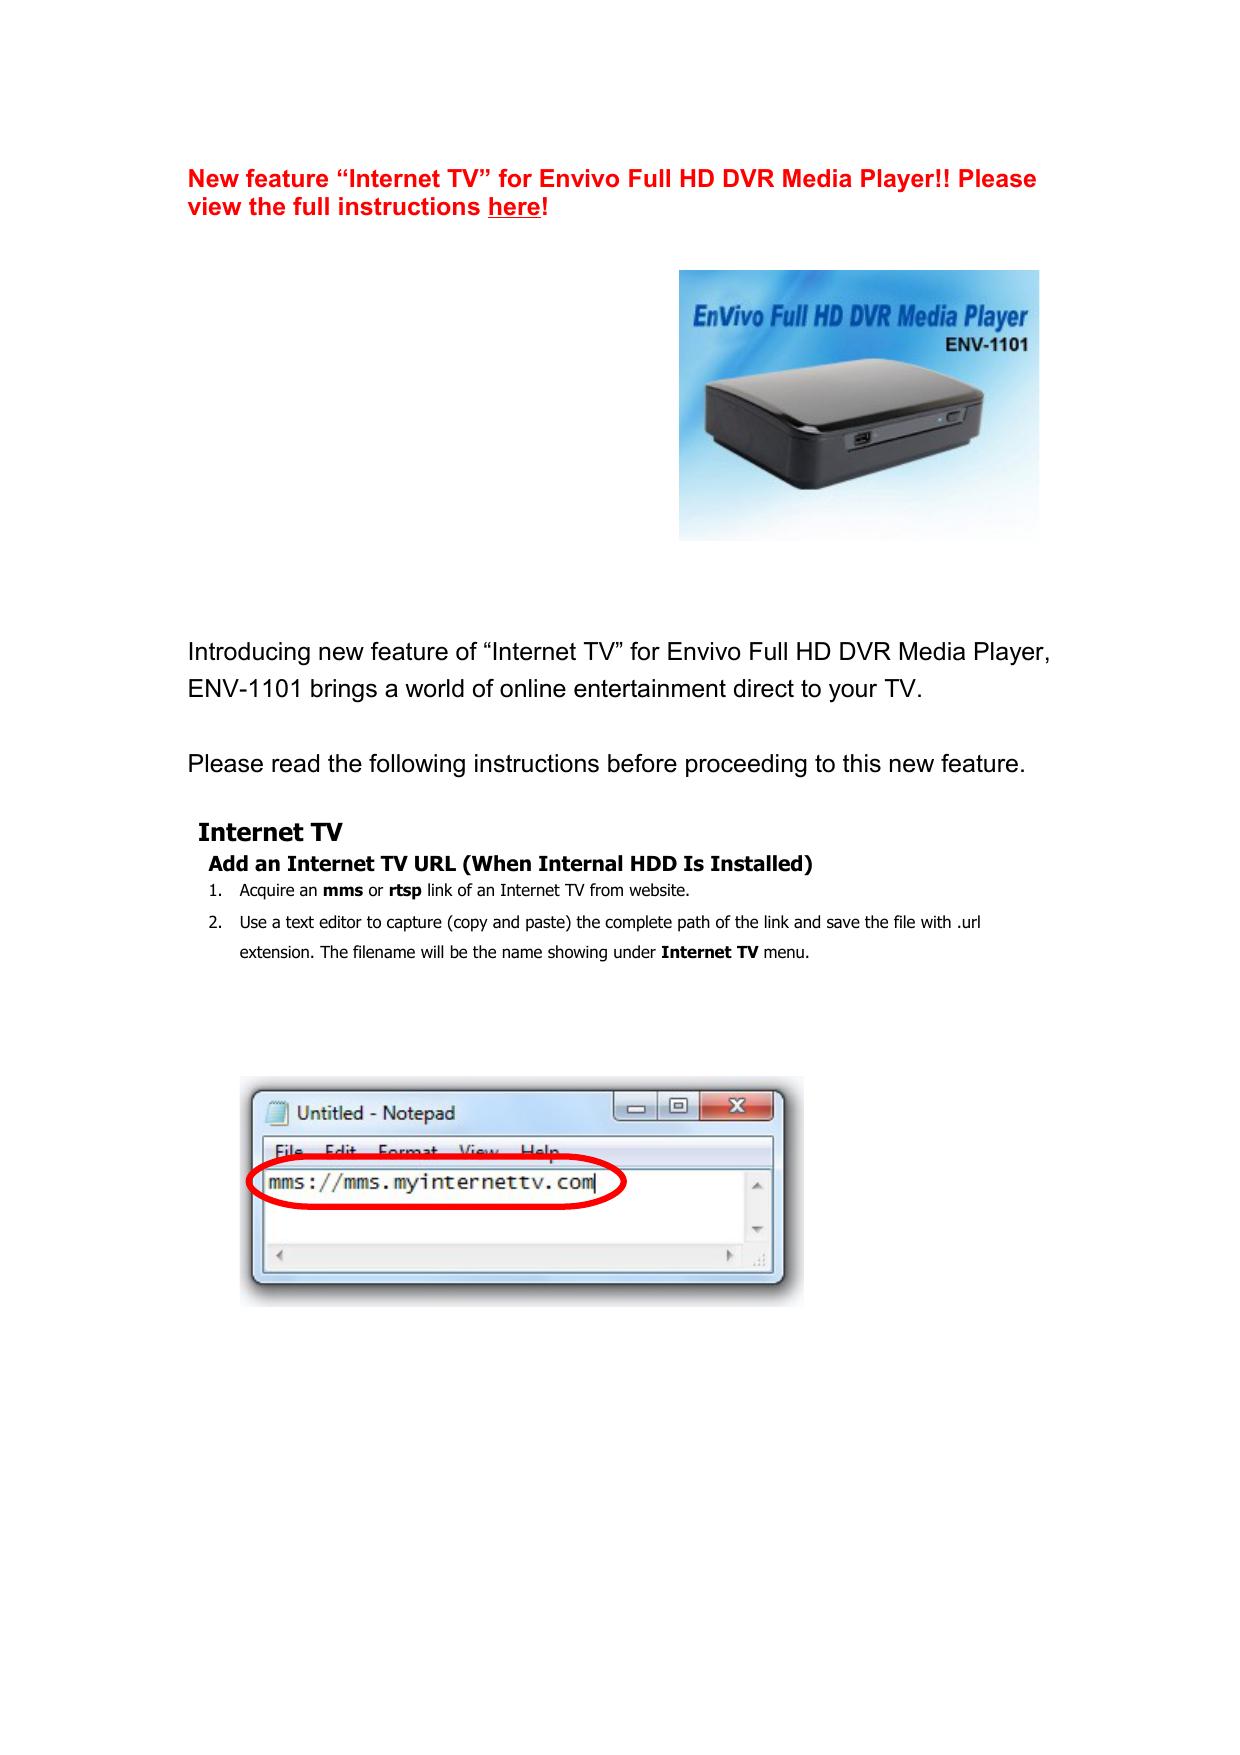 argosy hv339t firmware